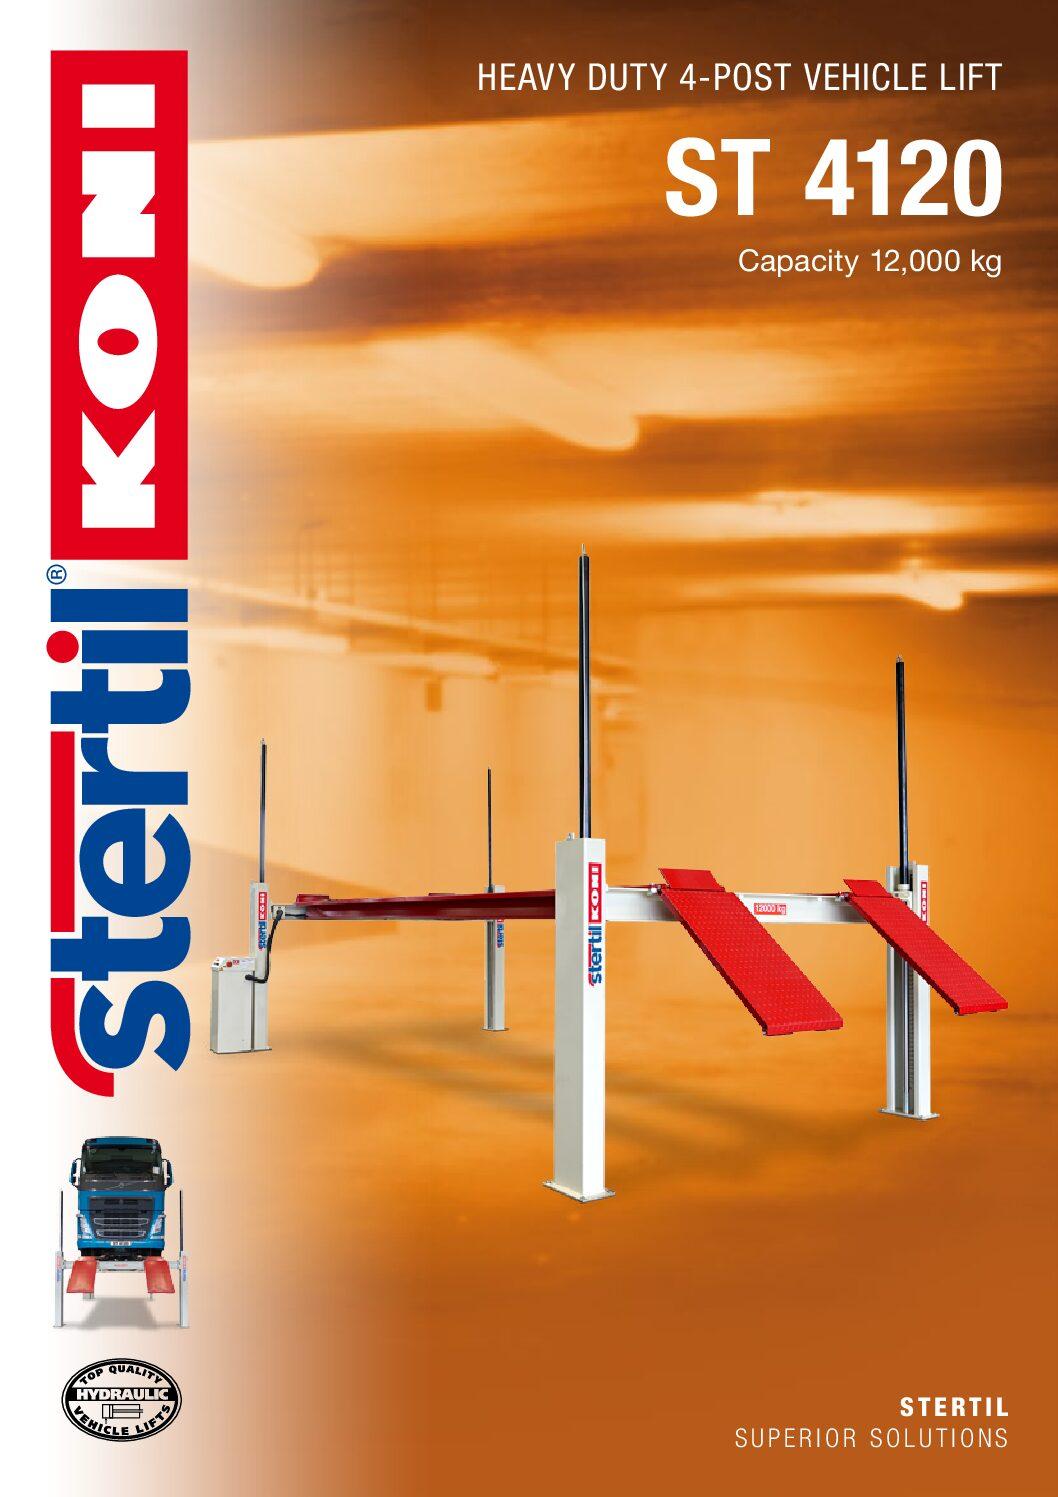 Stertil-Koni: ST 4120 – GB Version